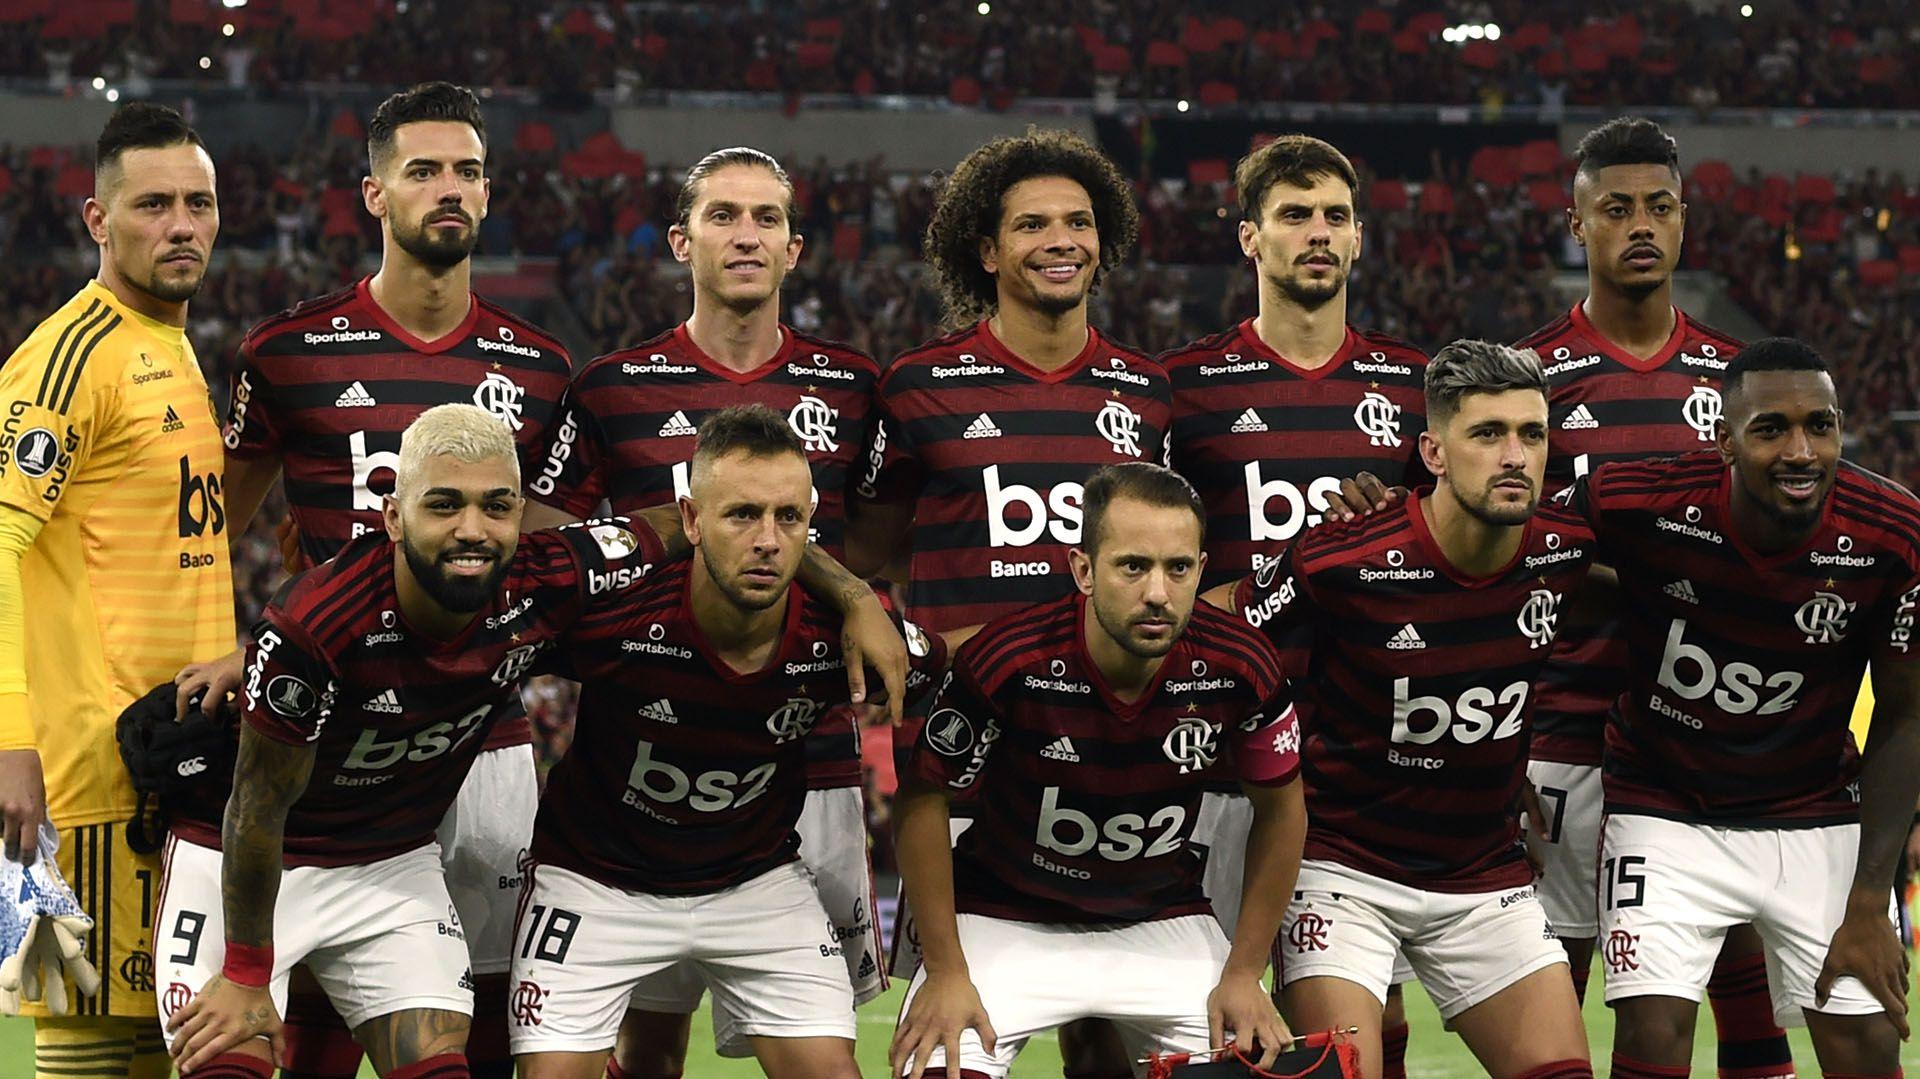 Flamengo's players pose before their Copa Libertadores second leg semi-final football match against Gremio, at Maracana stadium in Rio de Janeiro, Brazil, on October 23, 2019. (Photo by MAURO PIMENTEL / AFP)